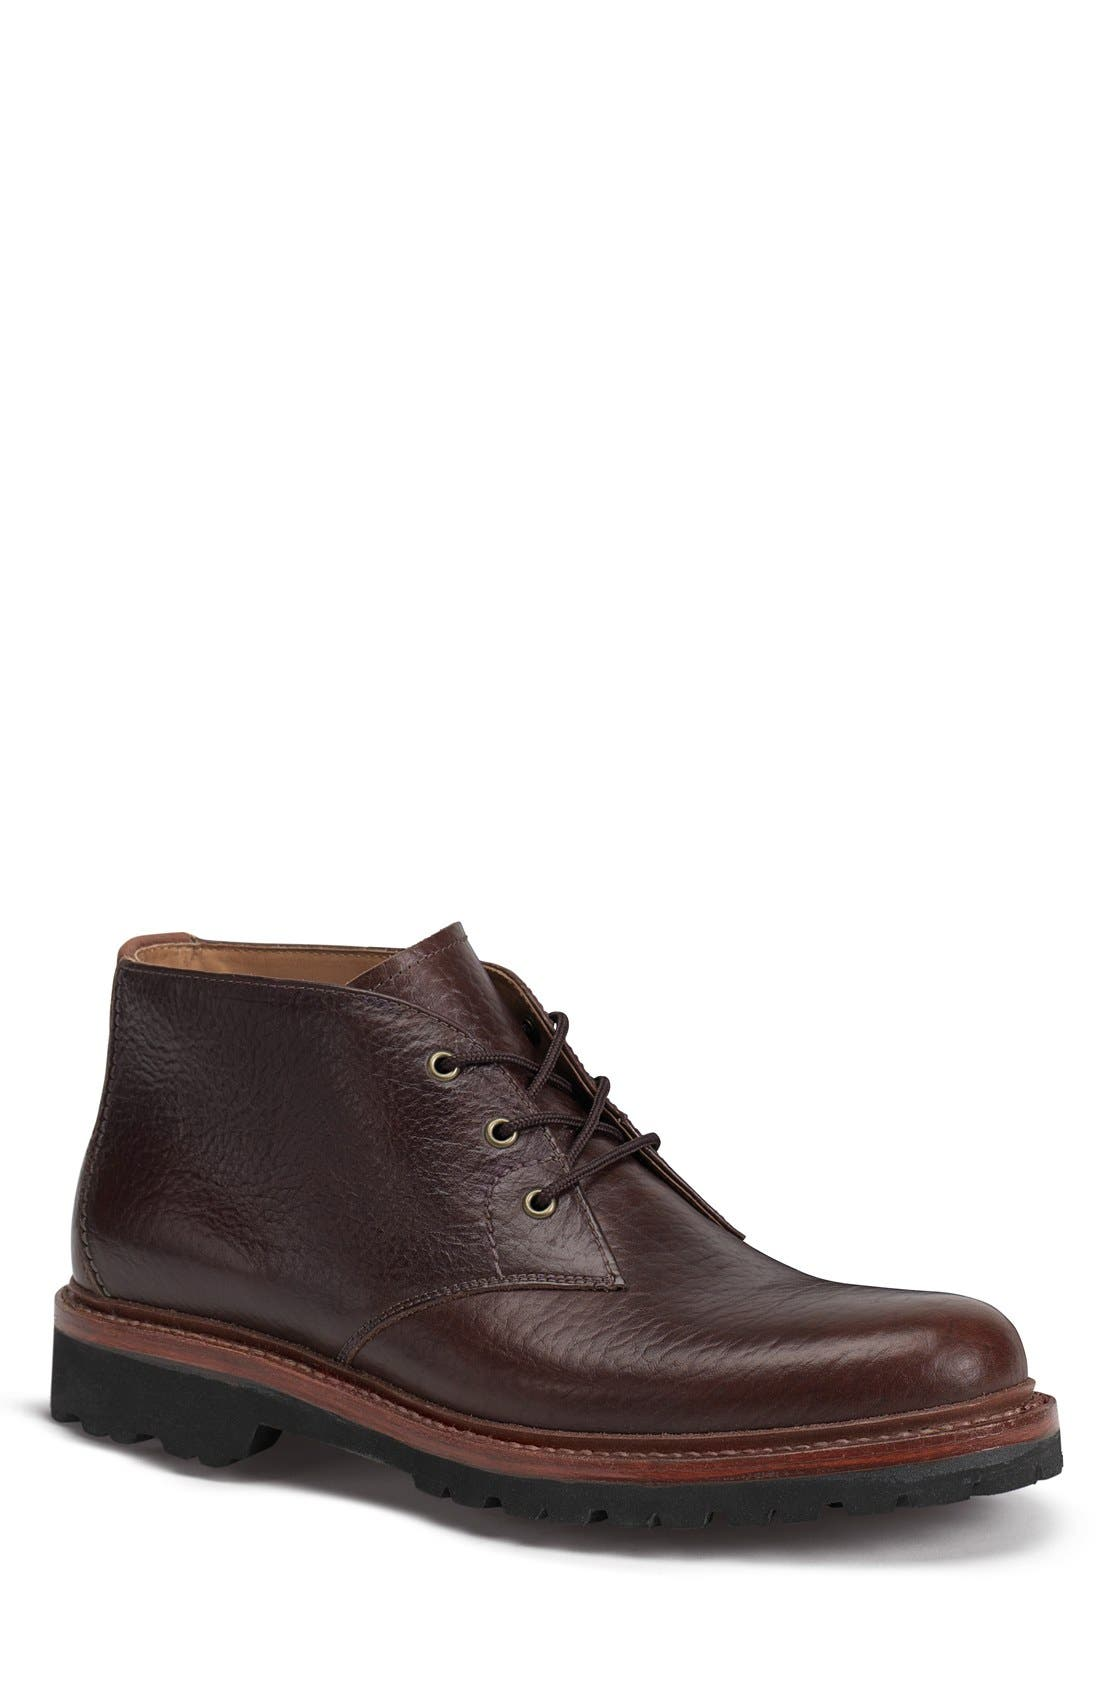 'Gulch II' Chukka Boot,                         Main,                         color, Bourbon Leather